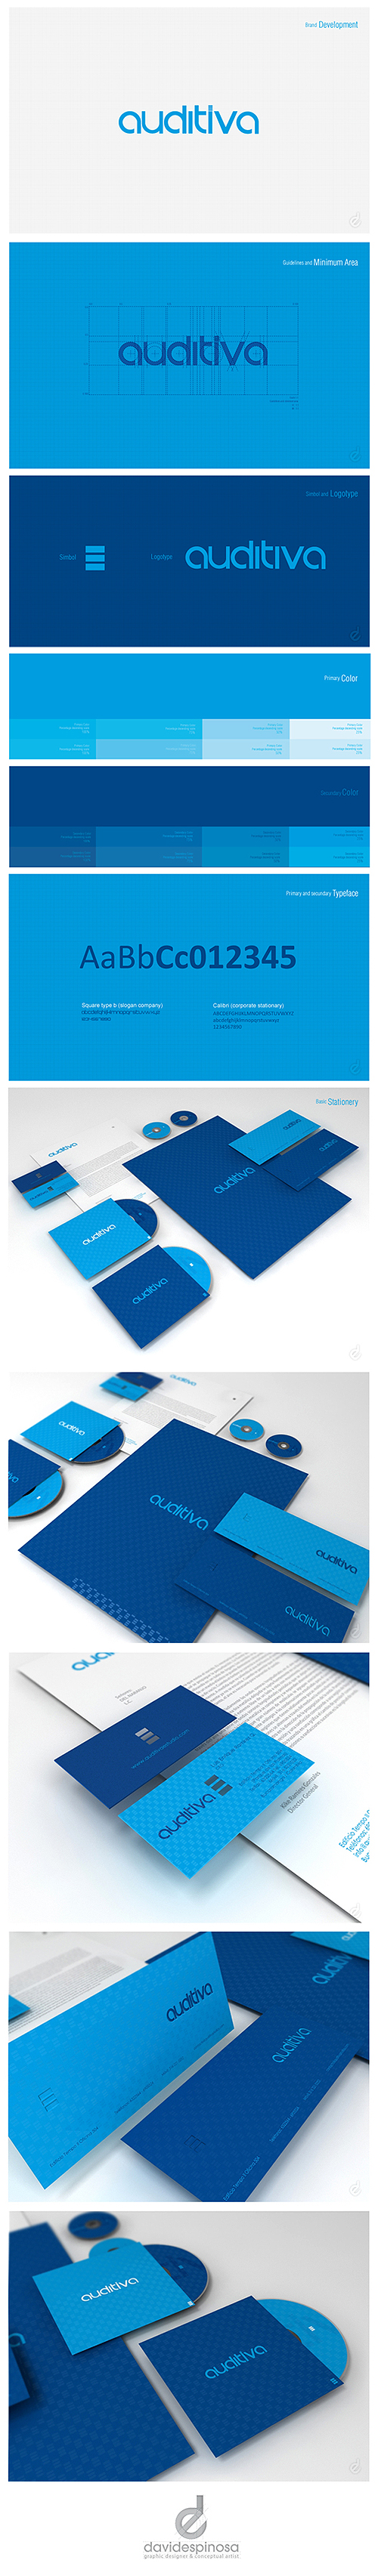 Brand Development AUDITIVA  by David Espinosa, via Behance